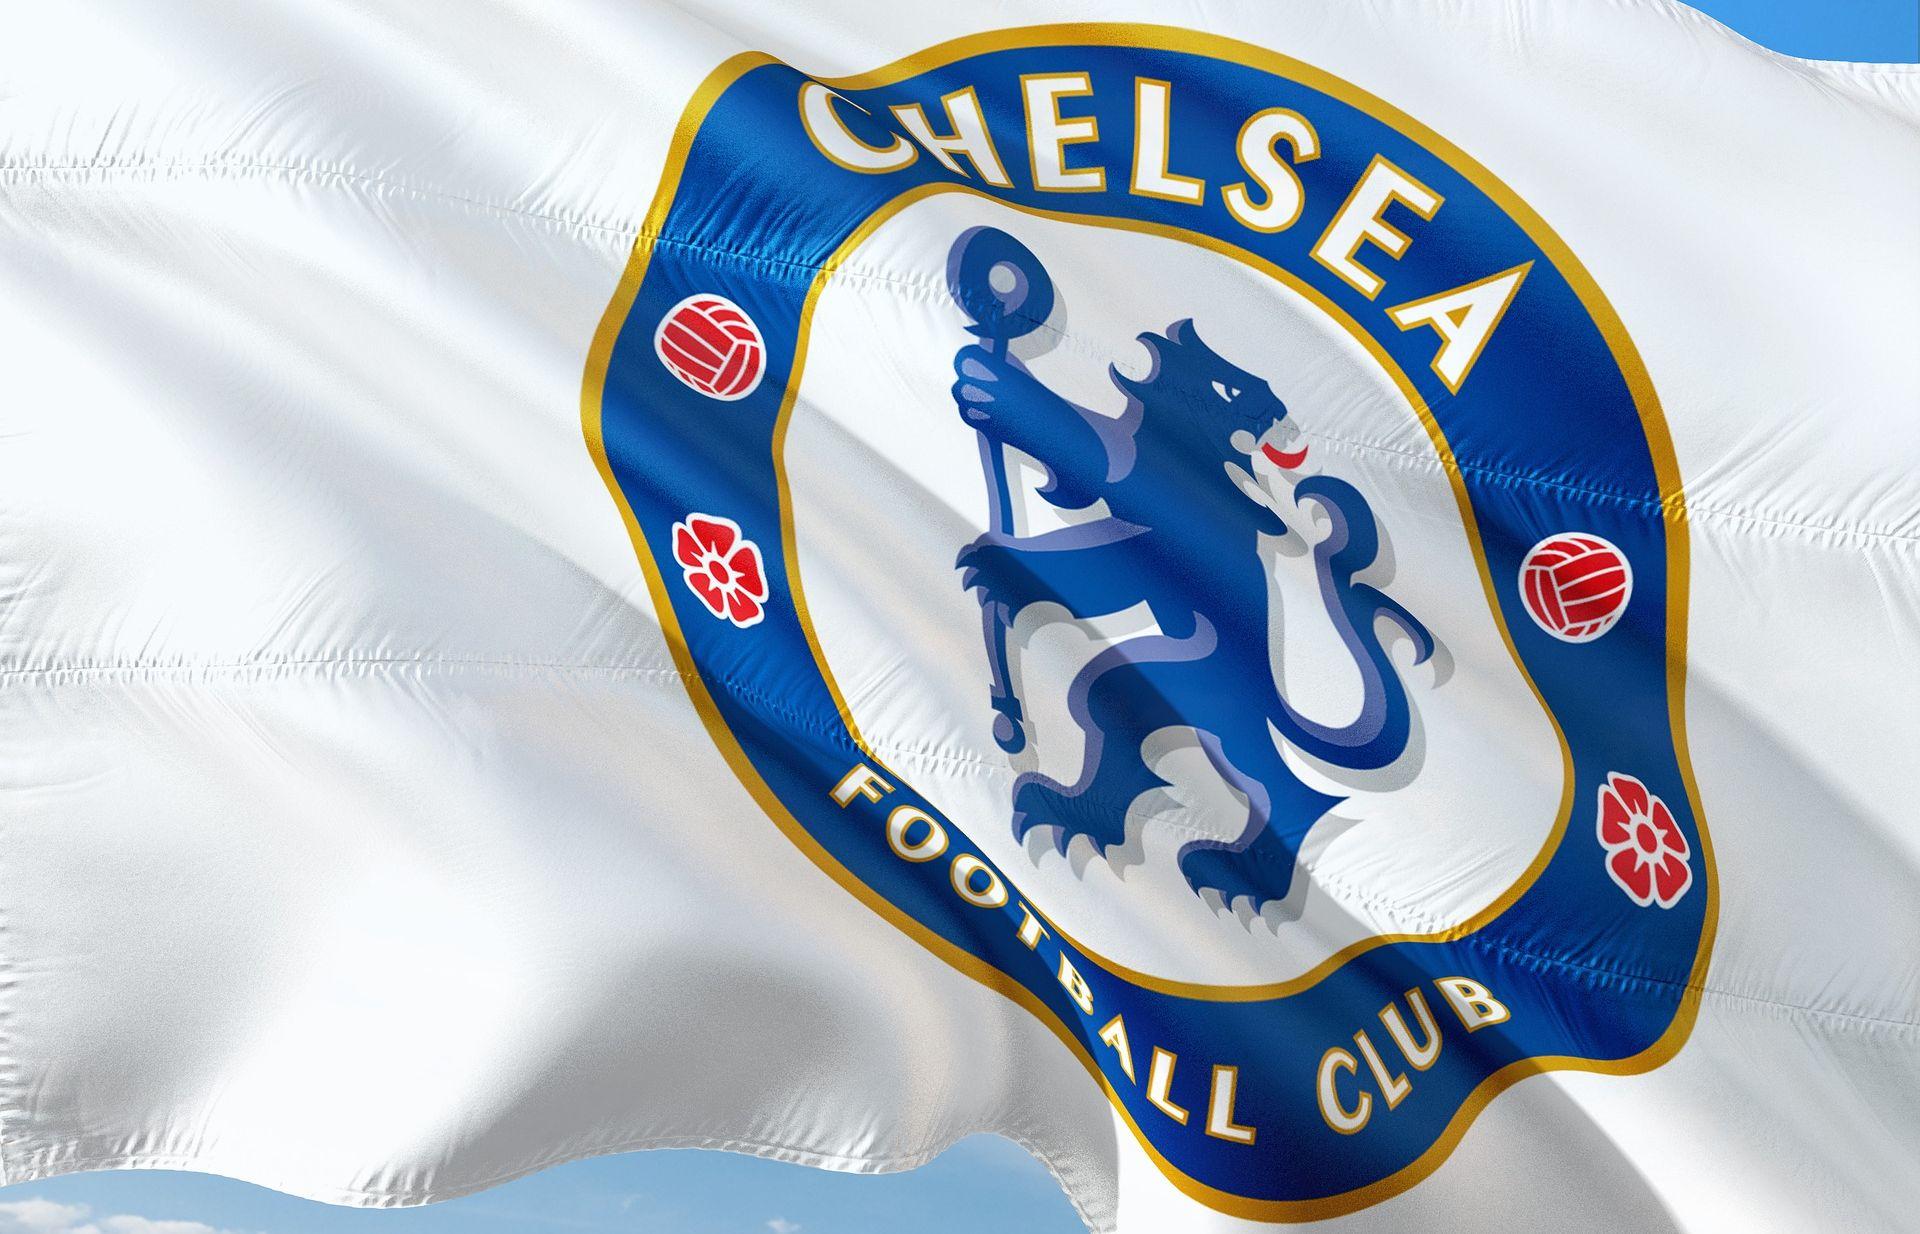 Chelsea realizirao dolazak Higuaina – njihov je do kraja sezone